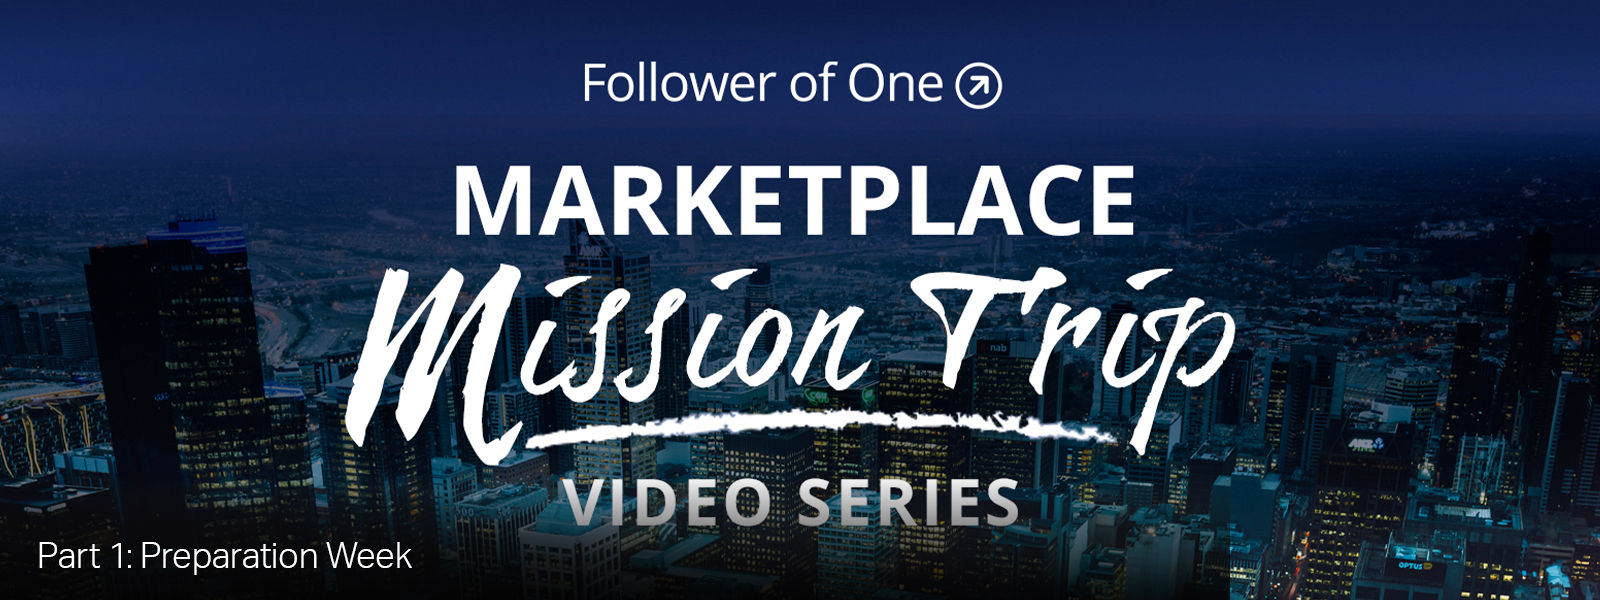 Marketplace Mission Trip Part 1 - Preparation Week